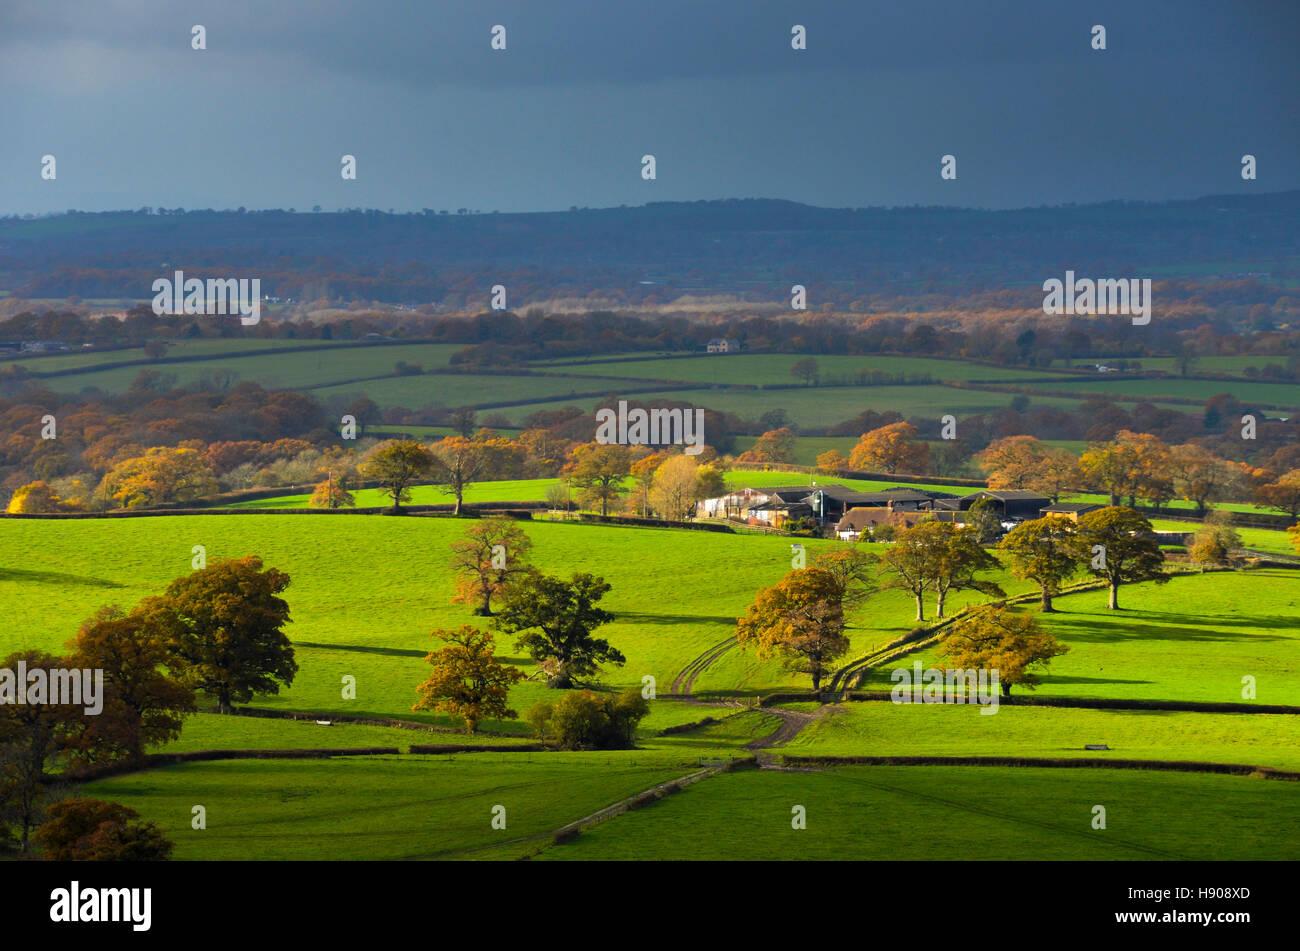 Shillingstone, Dorset, UK.  17th November 2016.  UK Weather.  A patch of sunlight illuminates the landscape near - Stock Image